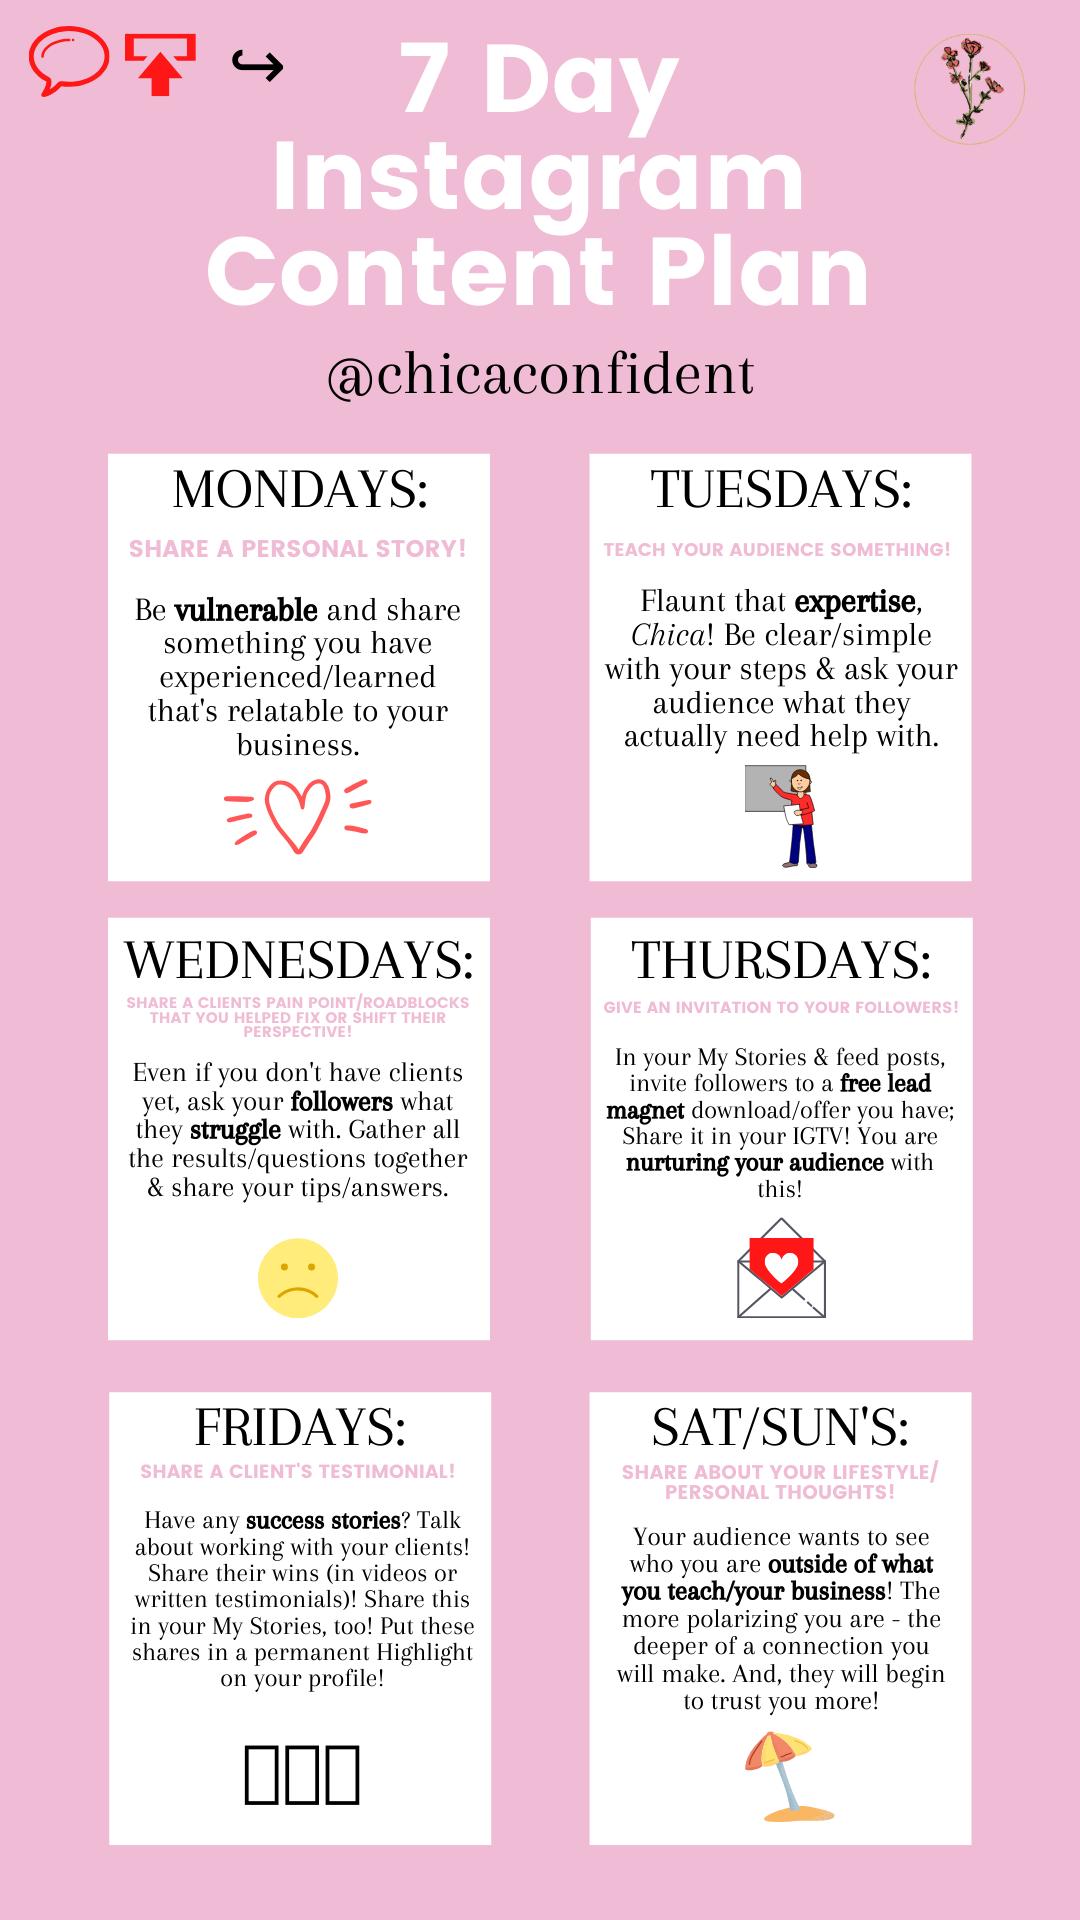 7 Day Instagram Content Plan Social Media Marketing Business Social Media Planner Social Media